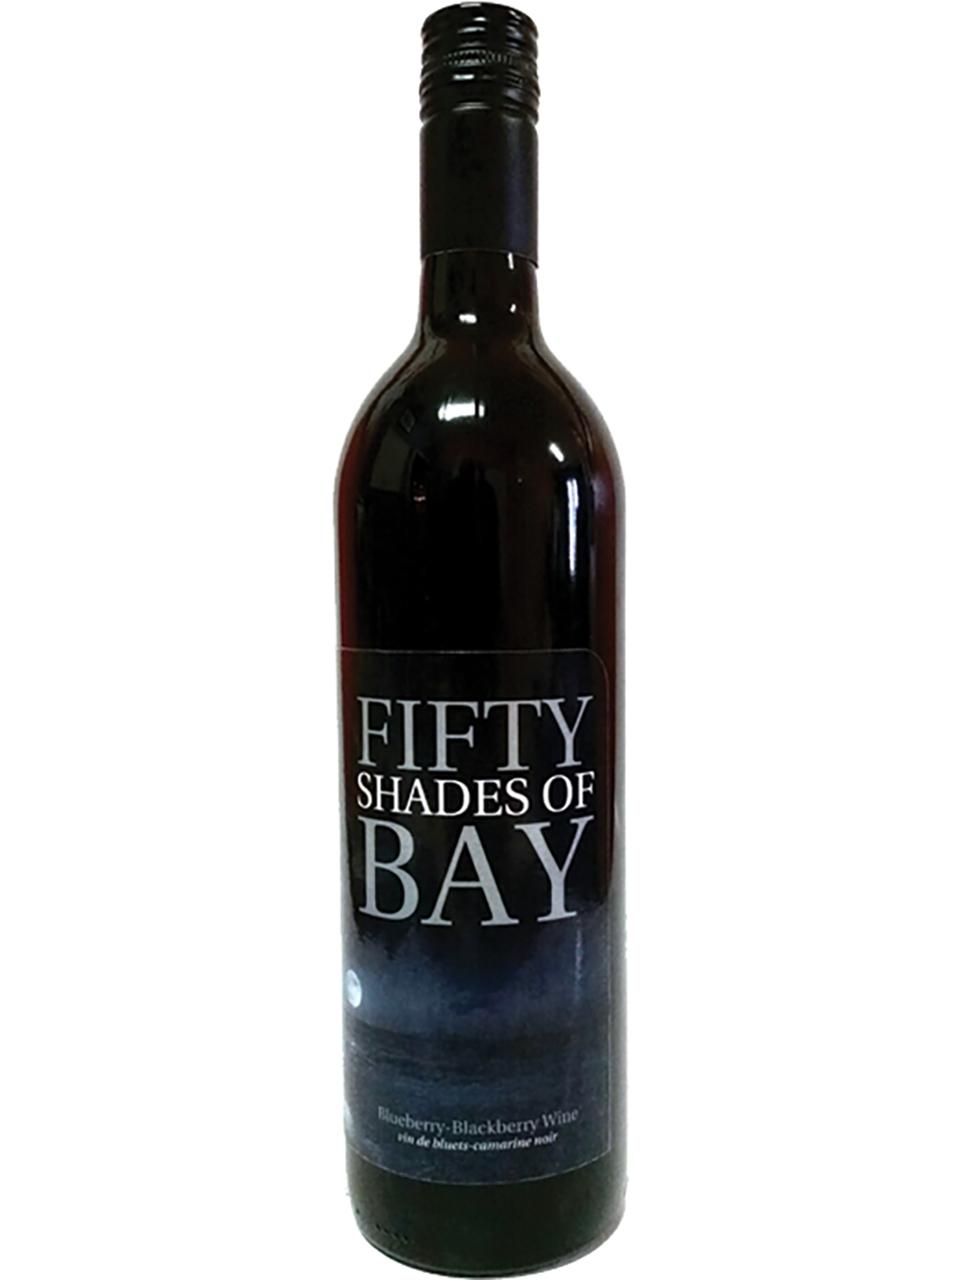 Fifty Shades of Bay